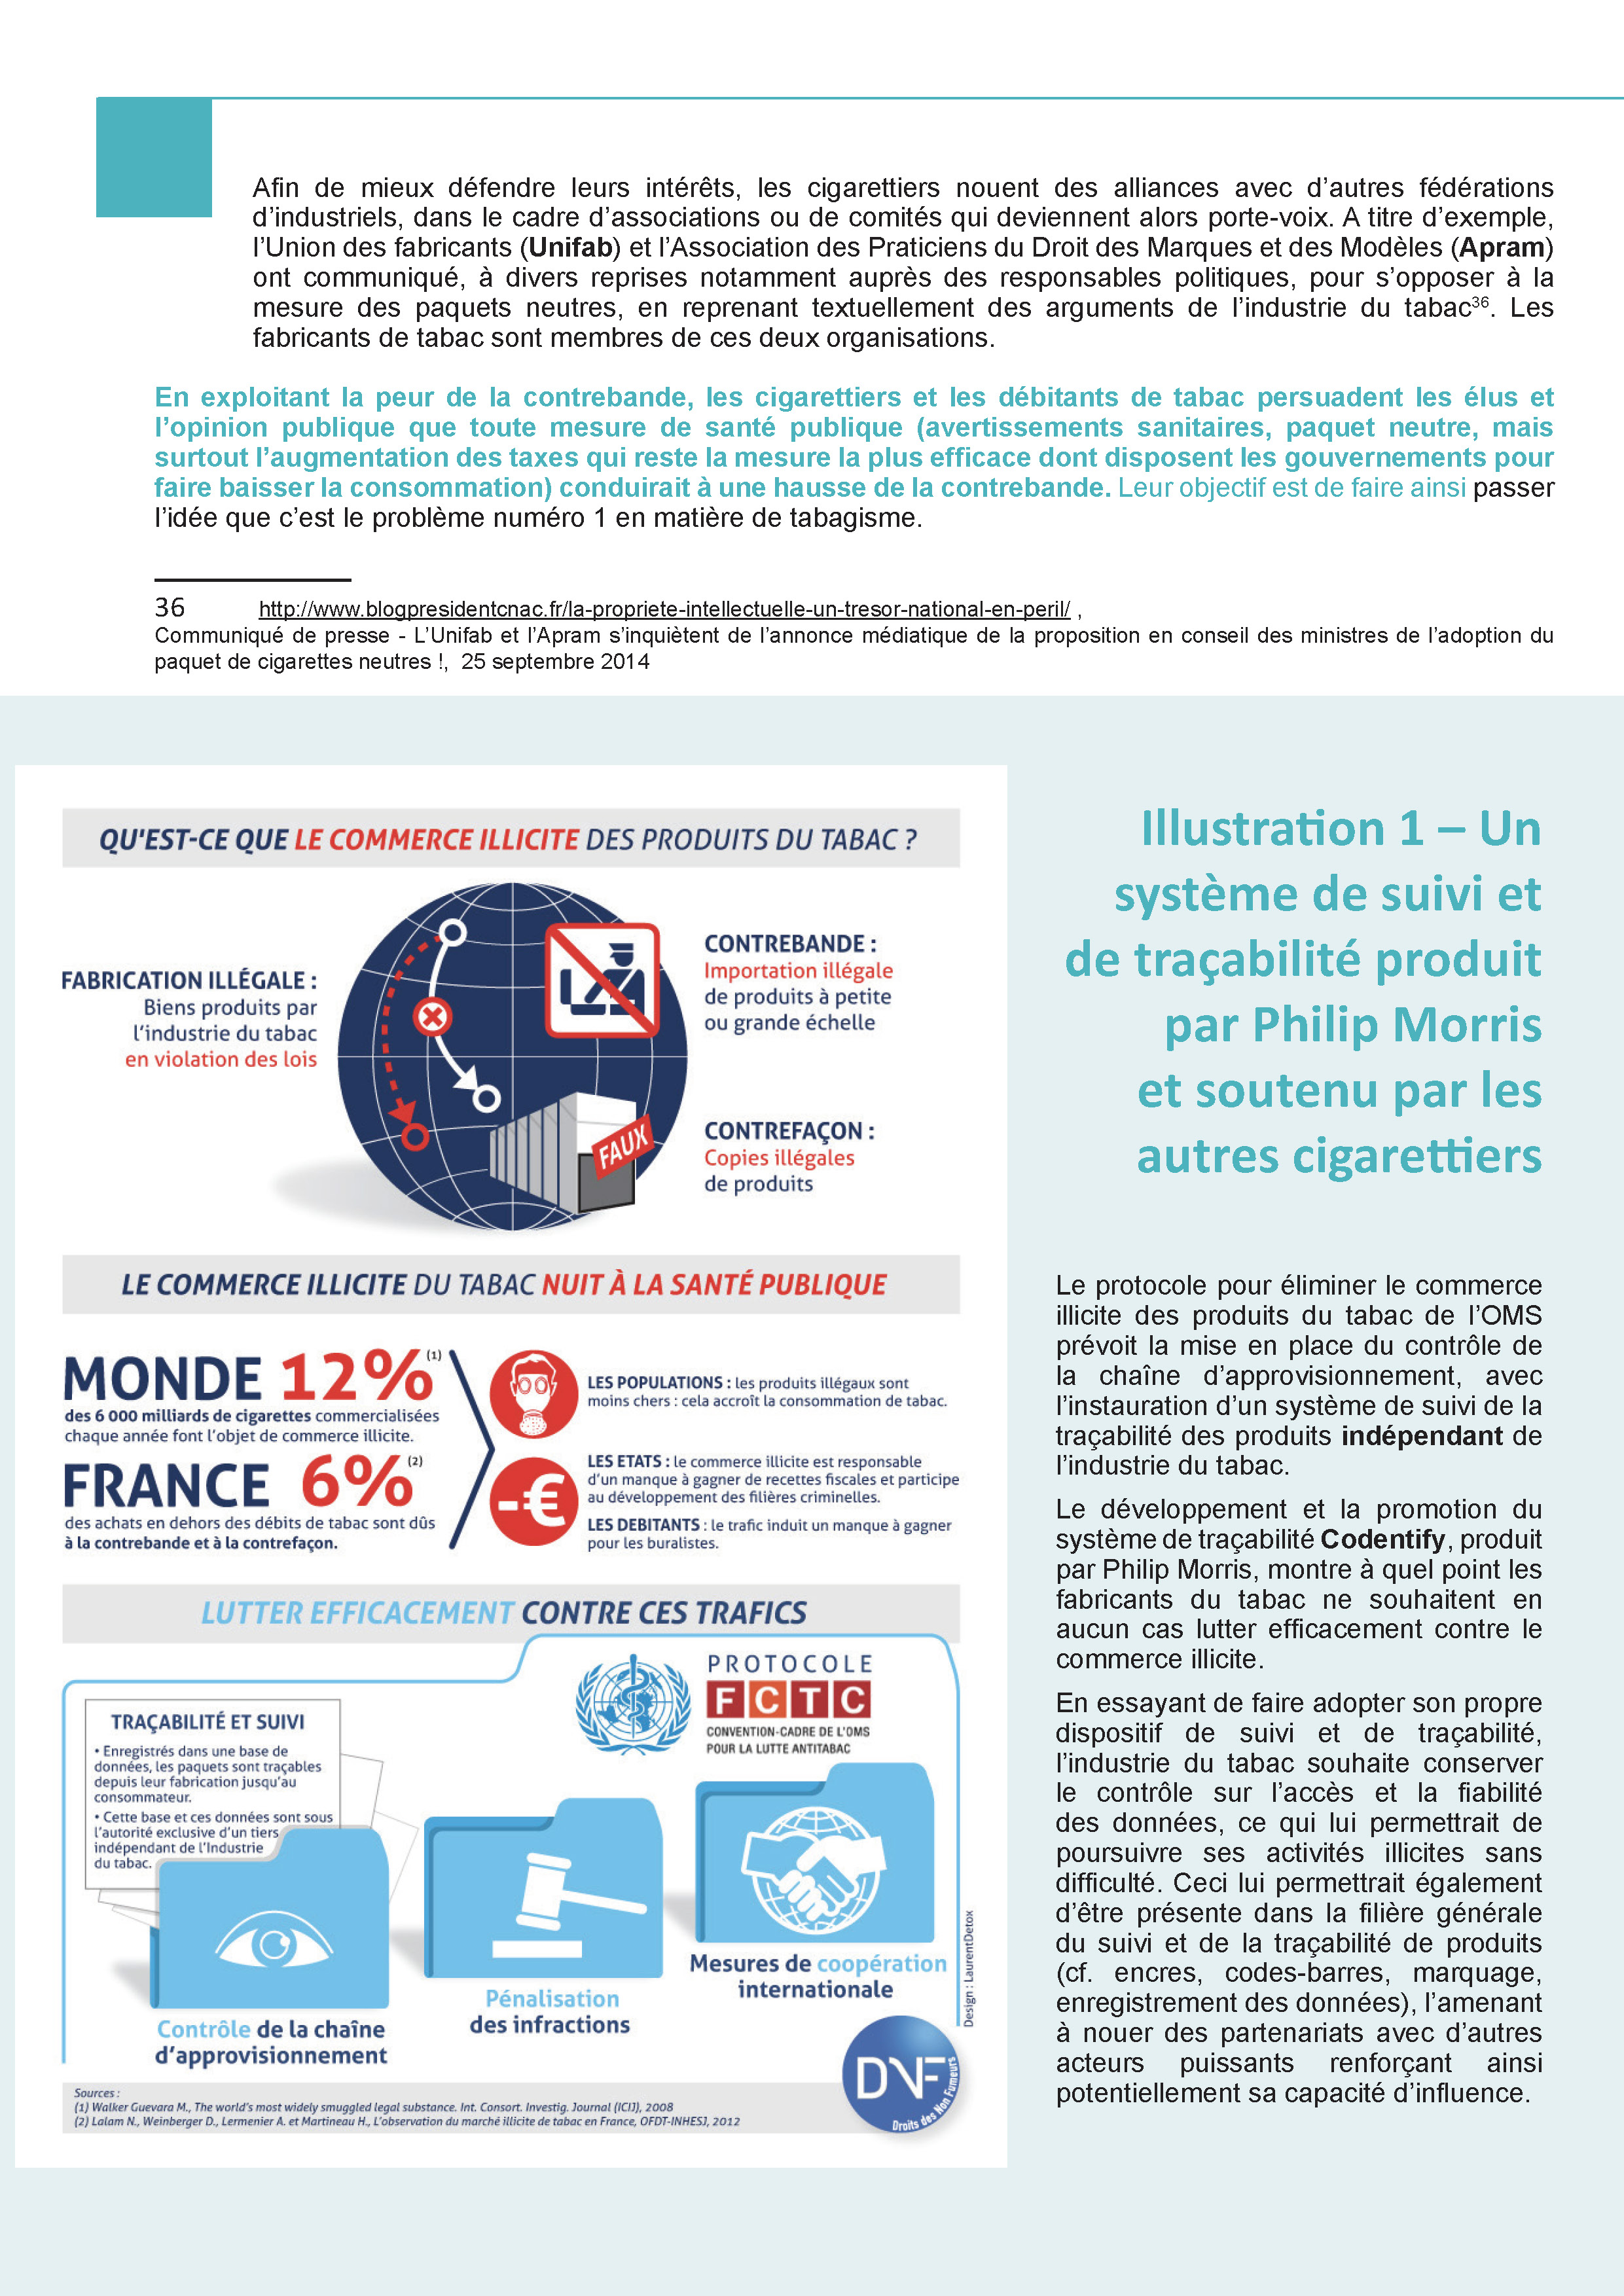 Alliance-DP_commerce-illicite-26mai2015_Page_10.jpg